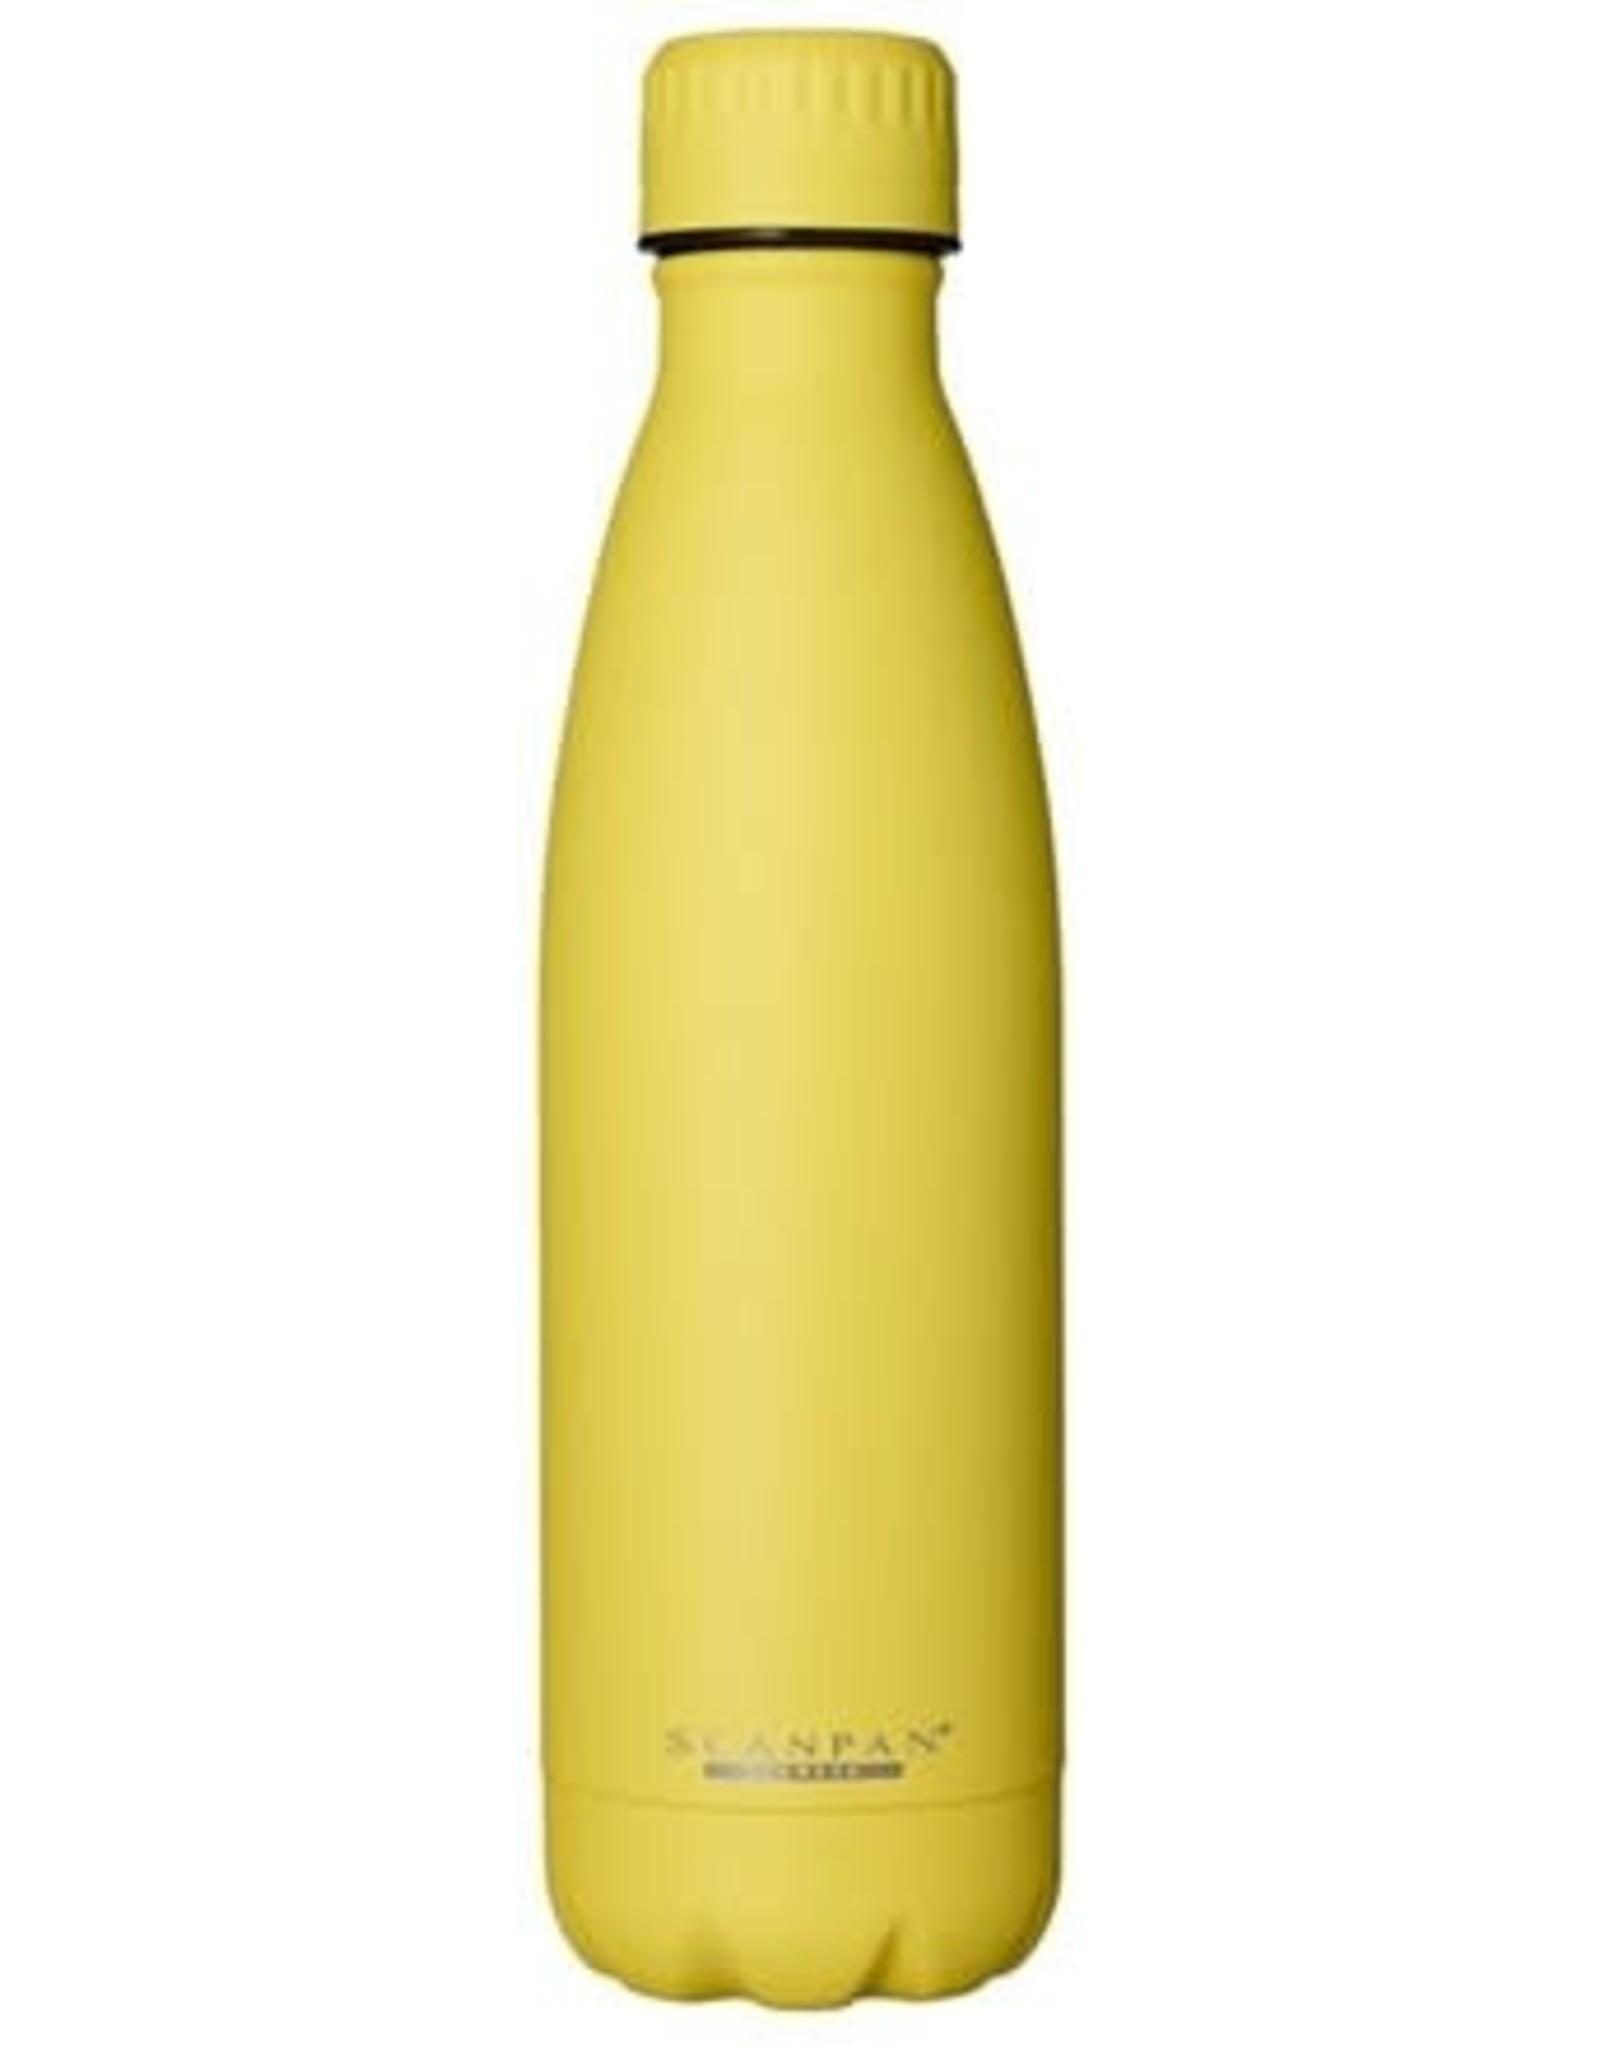 Scanpan 500 ml isoleerfles, PrimroseYellow